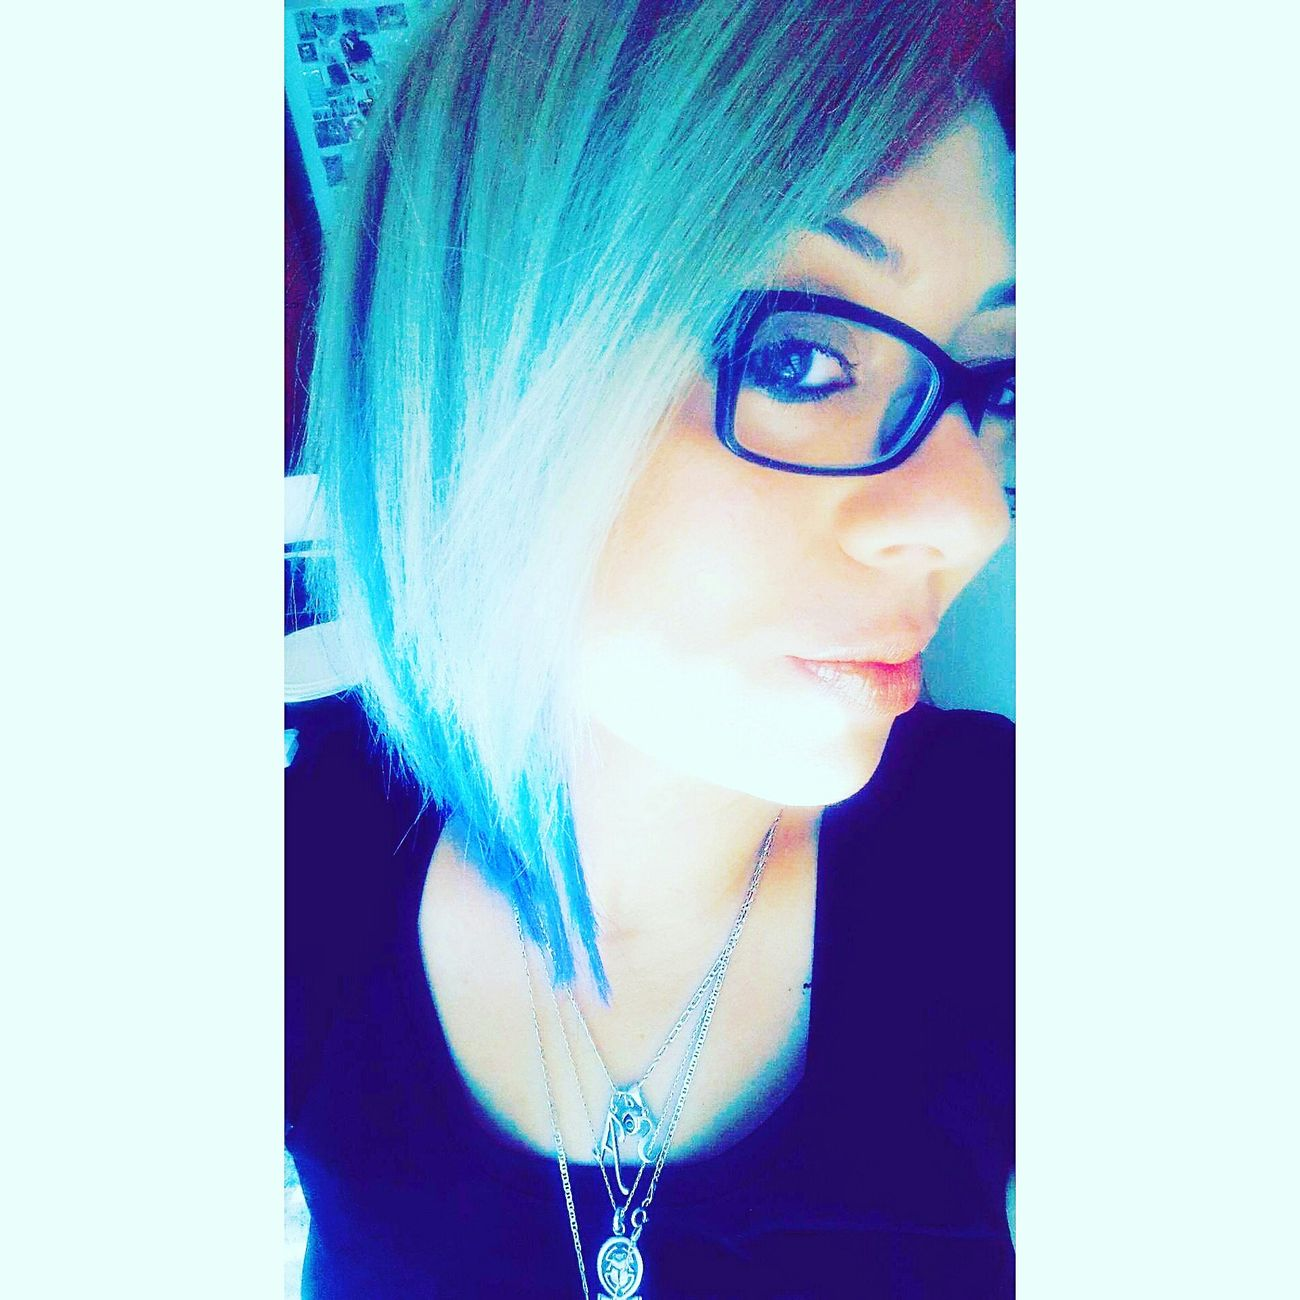 new hair color .... That's Me Turnback Uglygirl  Hello World EyeEm Fashion&love&beauty Iyiyim Illbeok Beforeoperation Myfight